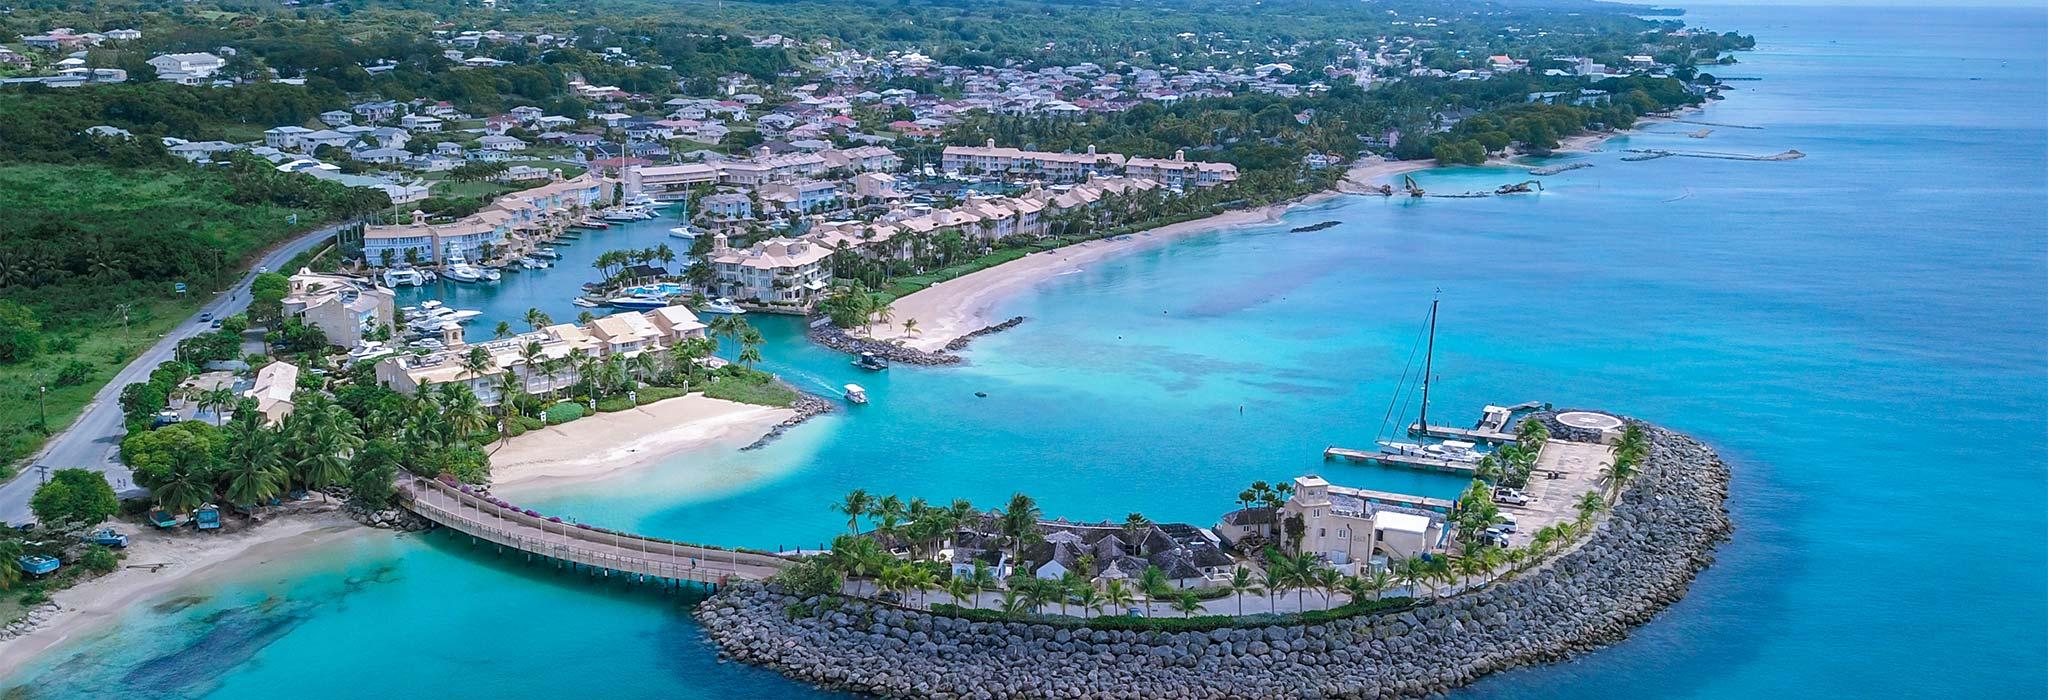 Barbados City View